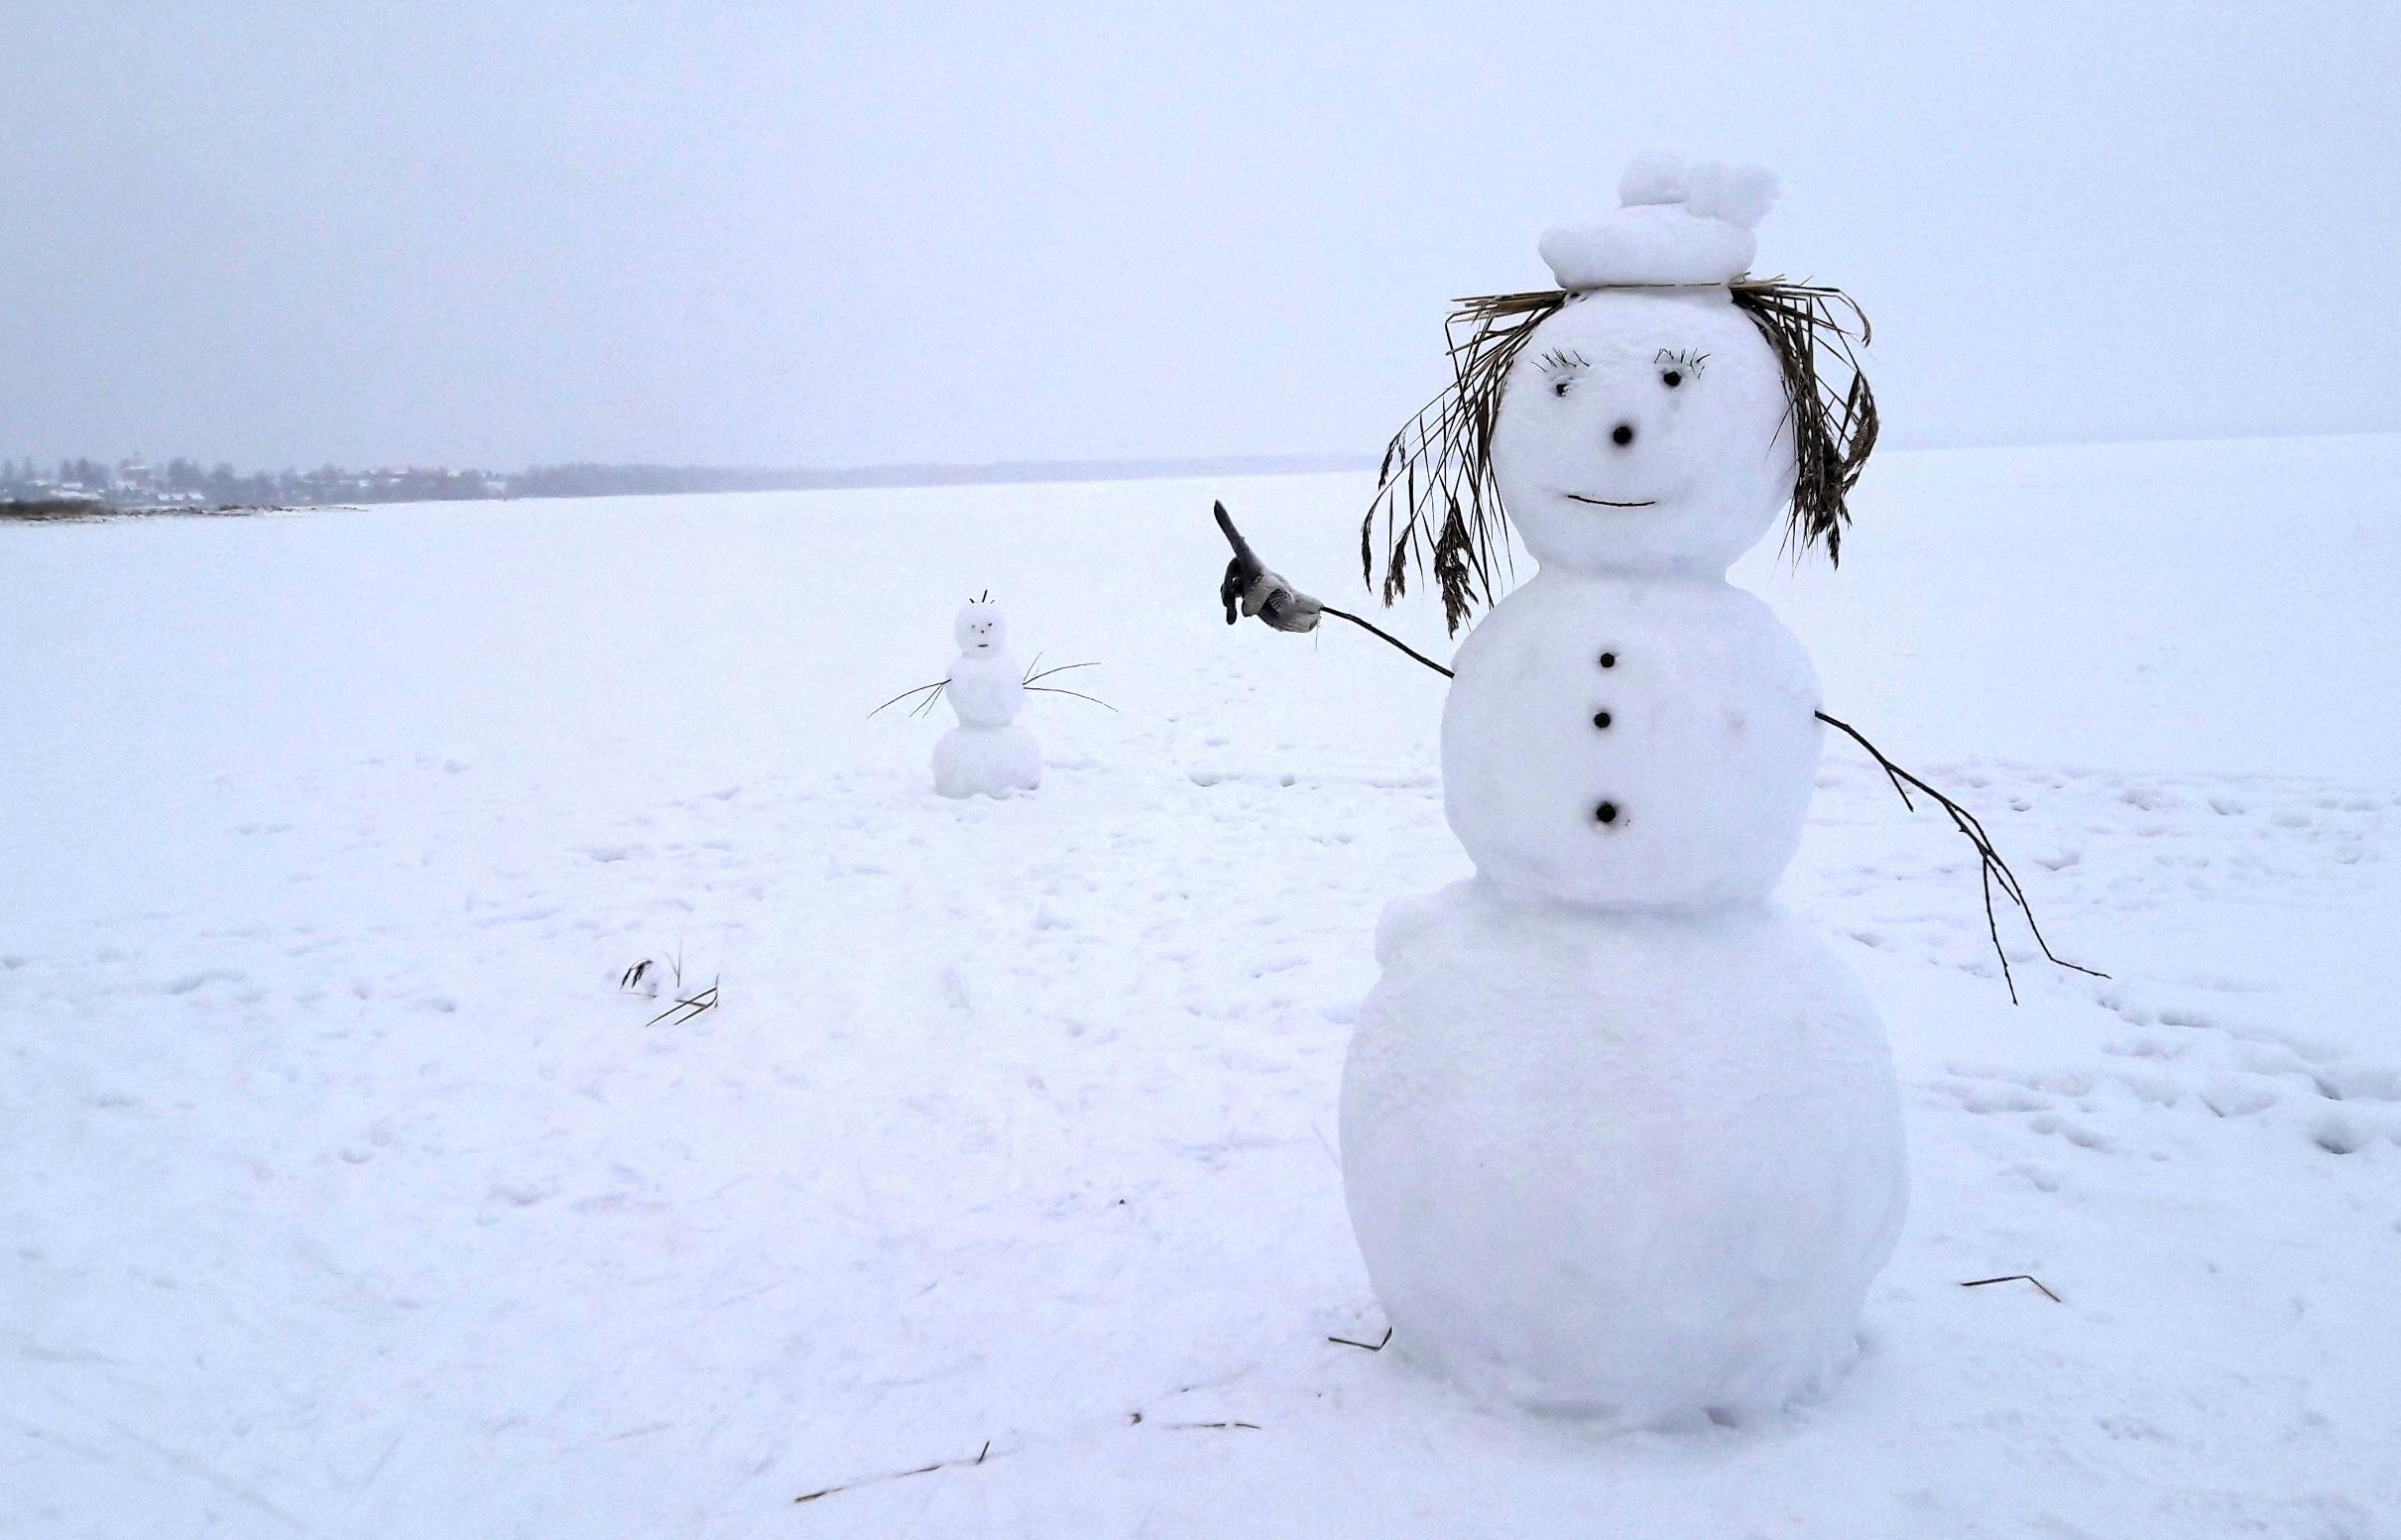 В Твери объявлен конкурс снеговиков - новости Афанасий